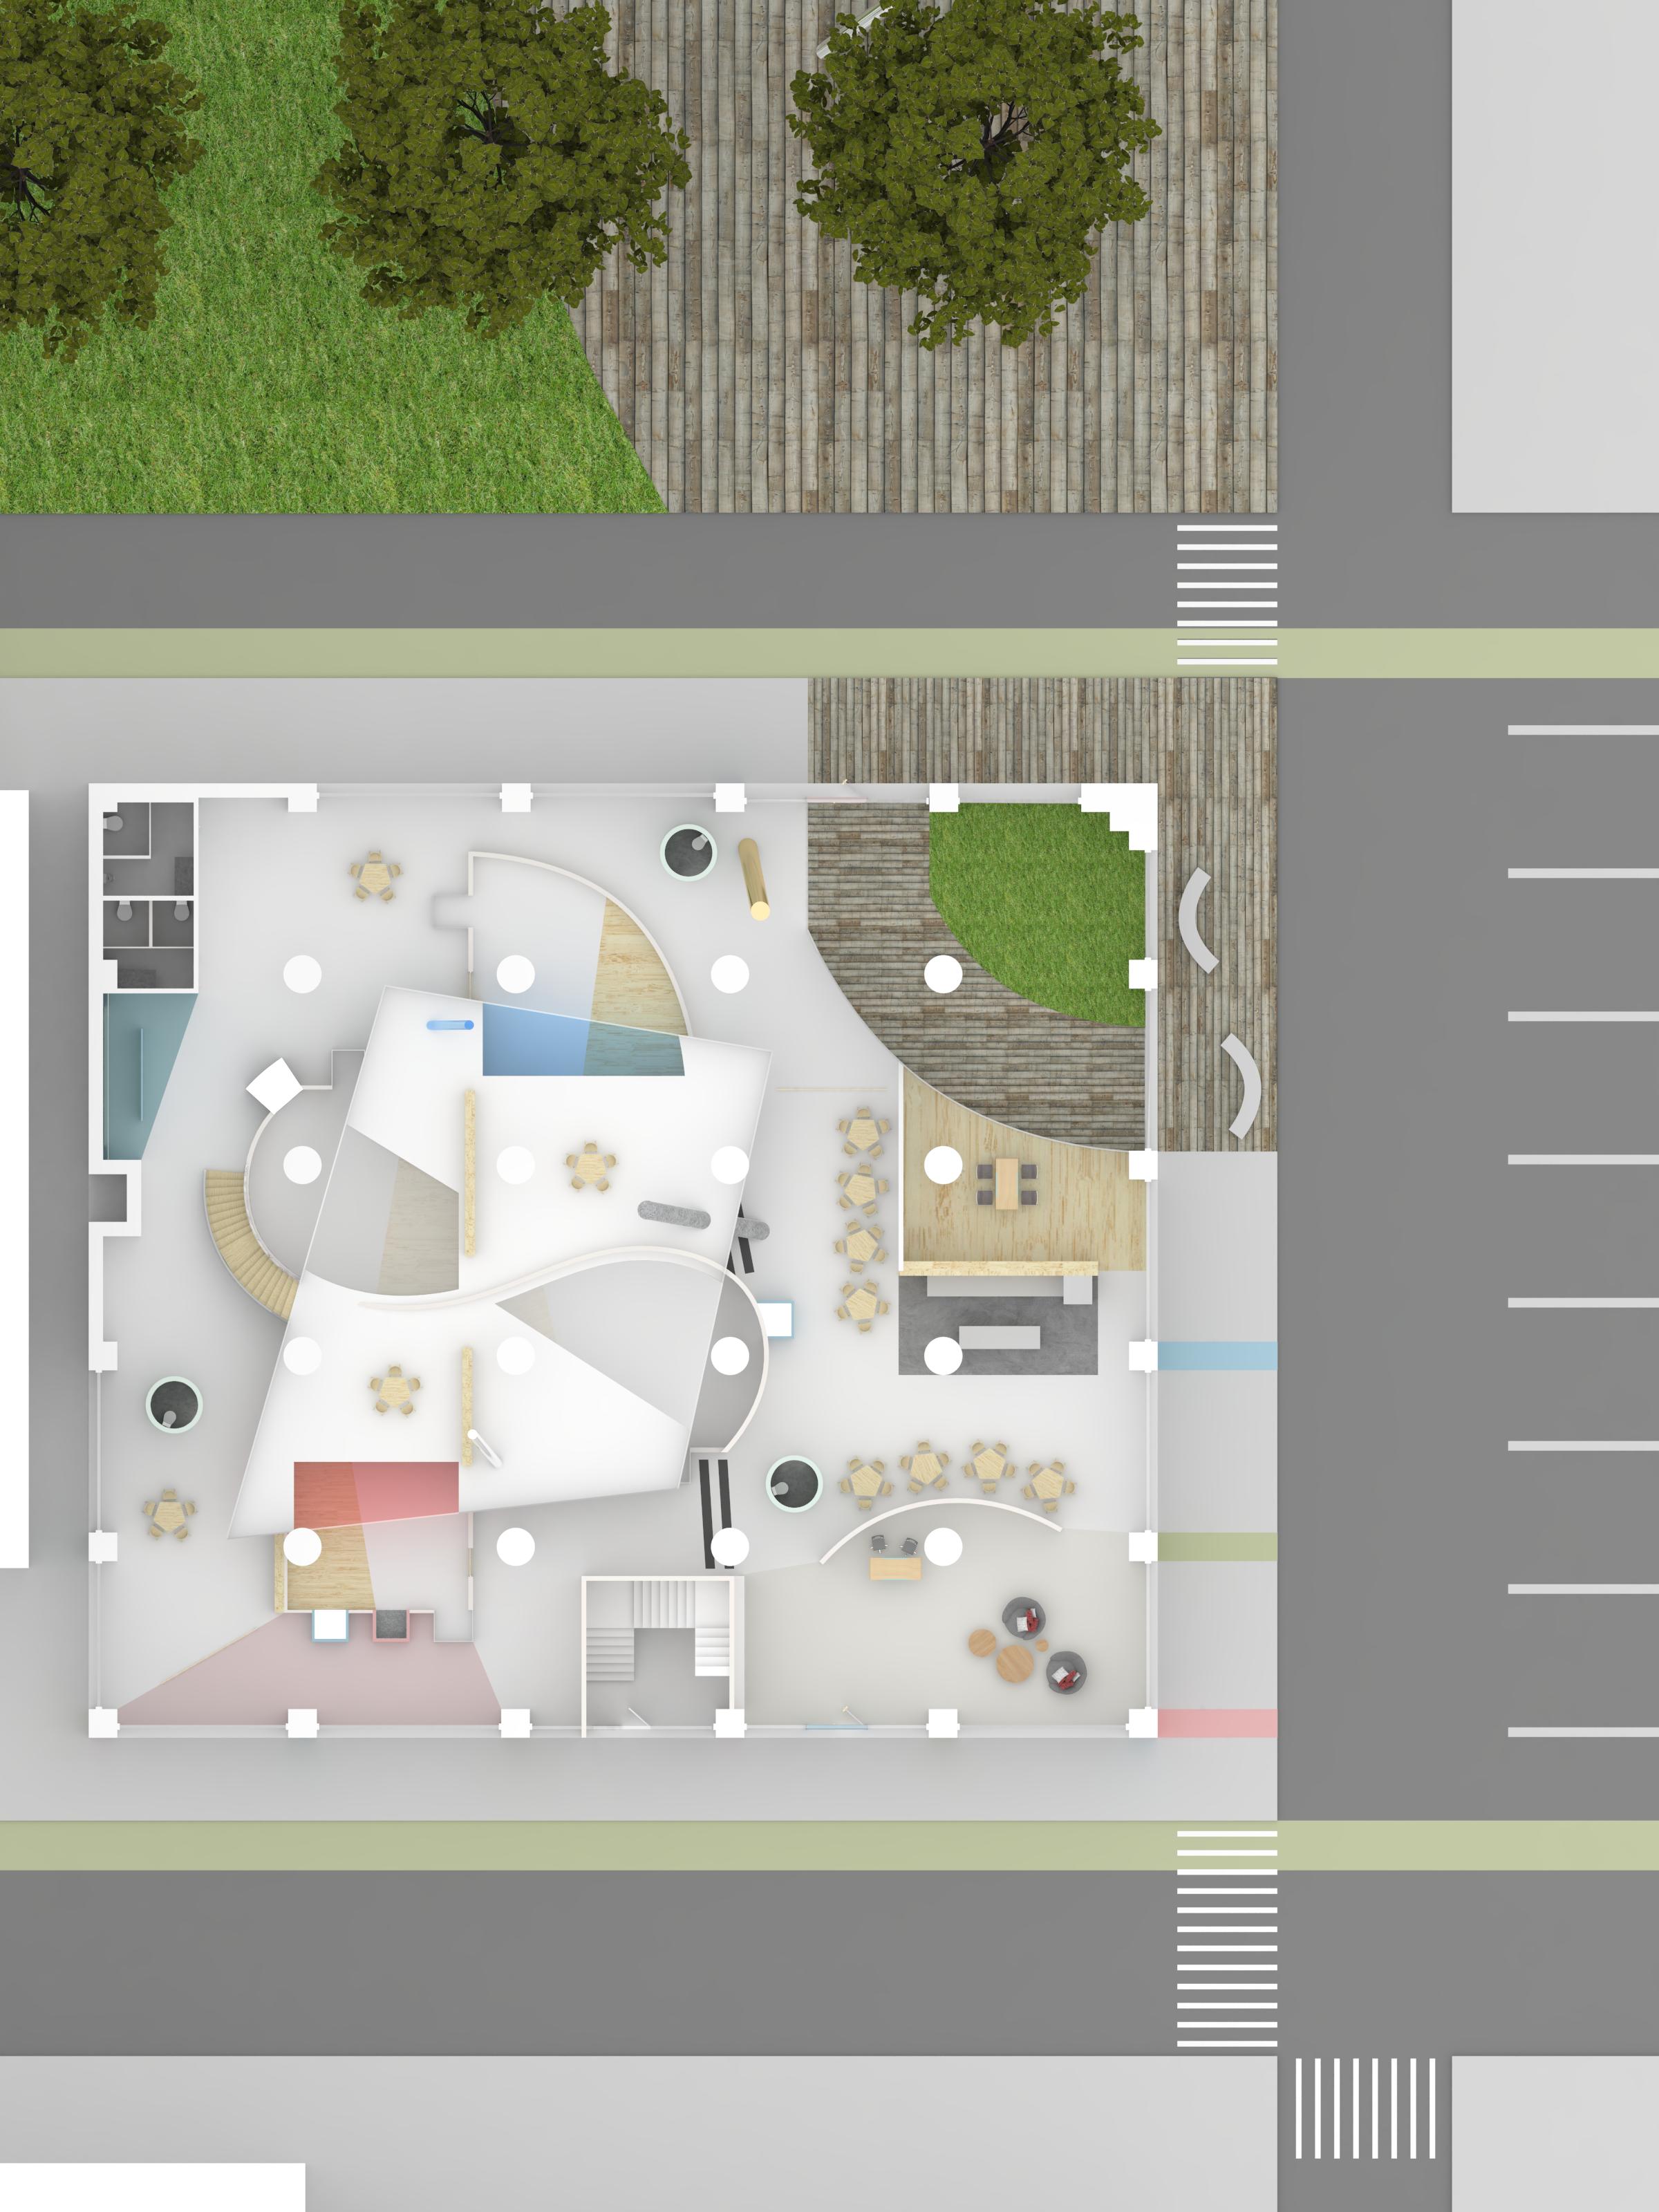 2nd floor rendered plan